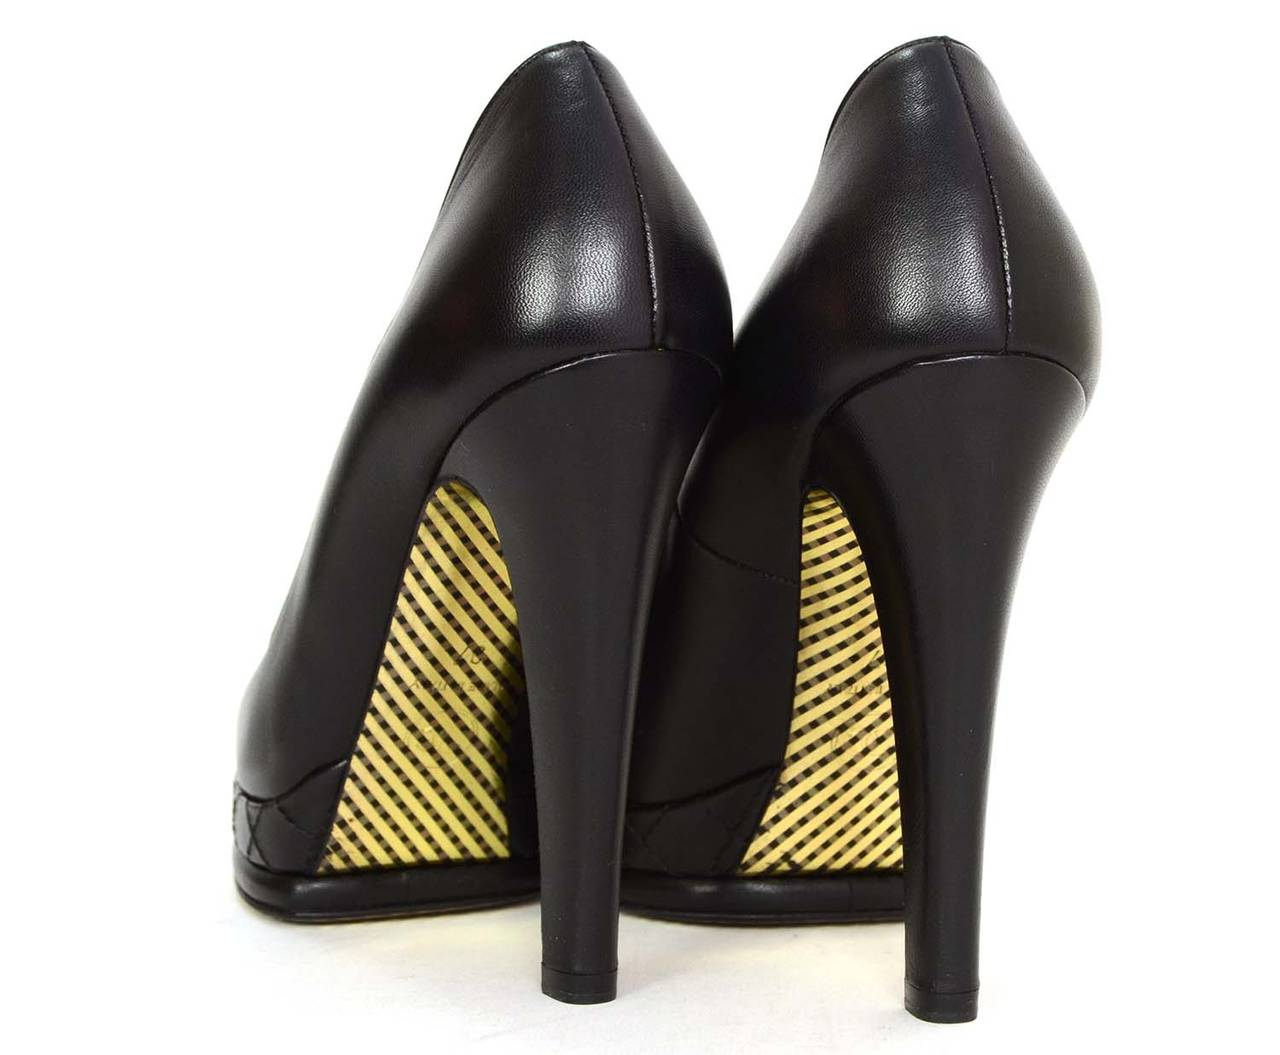 CHANEL Black Leather Round Toe Pumps sz 37 4